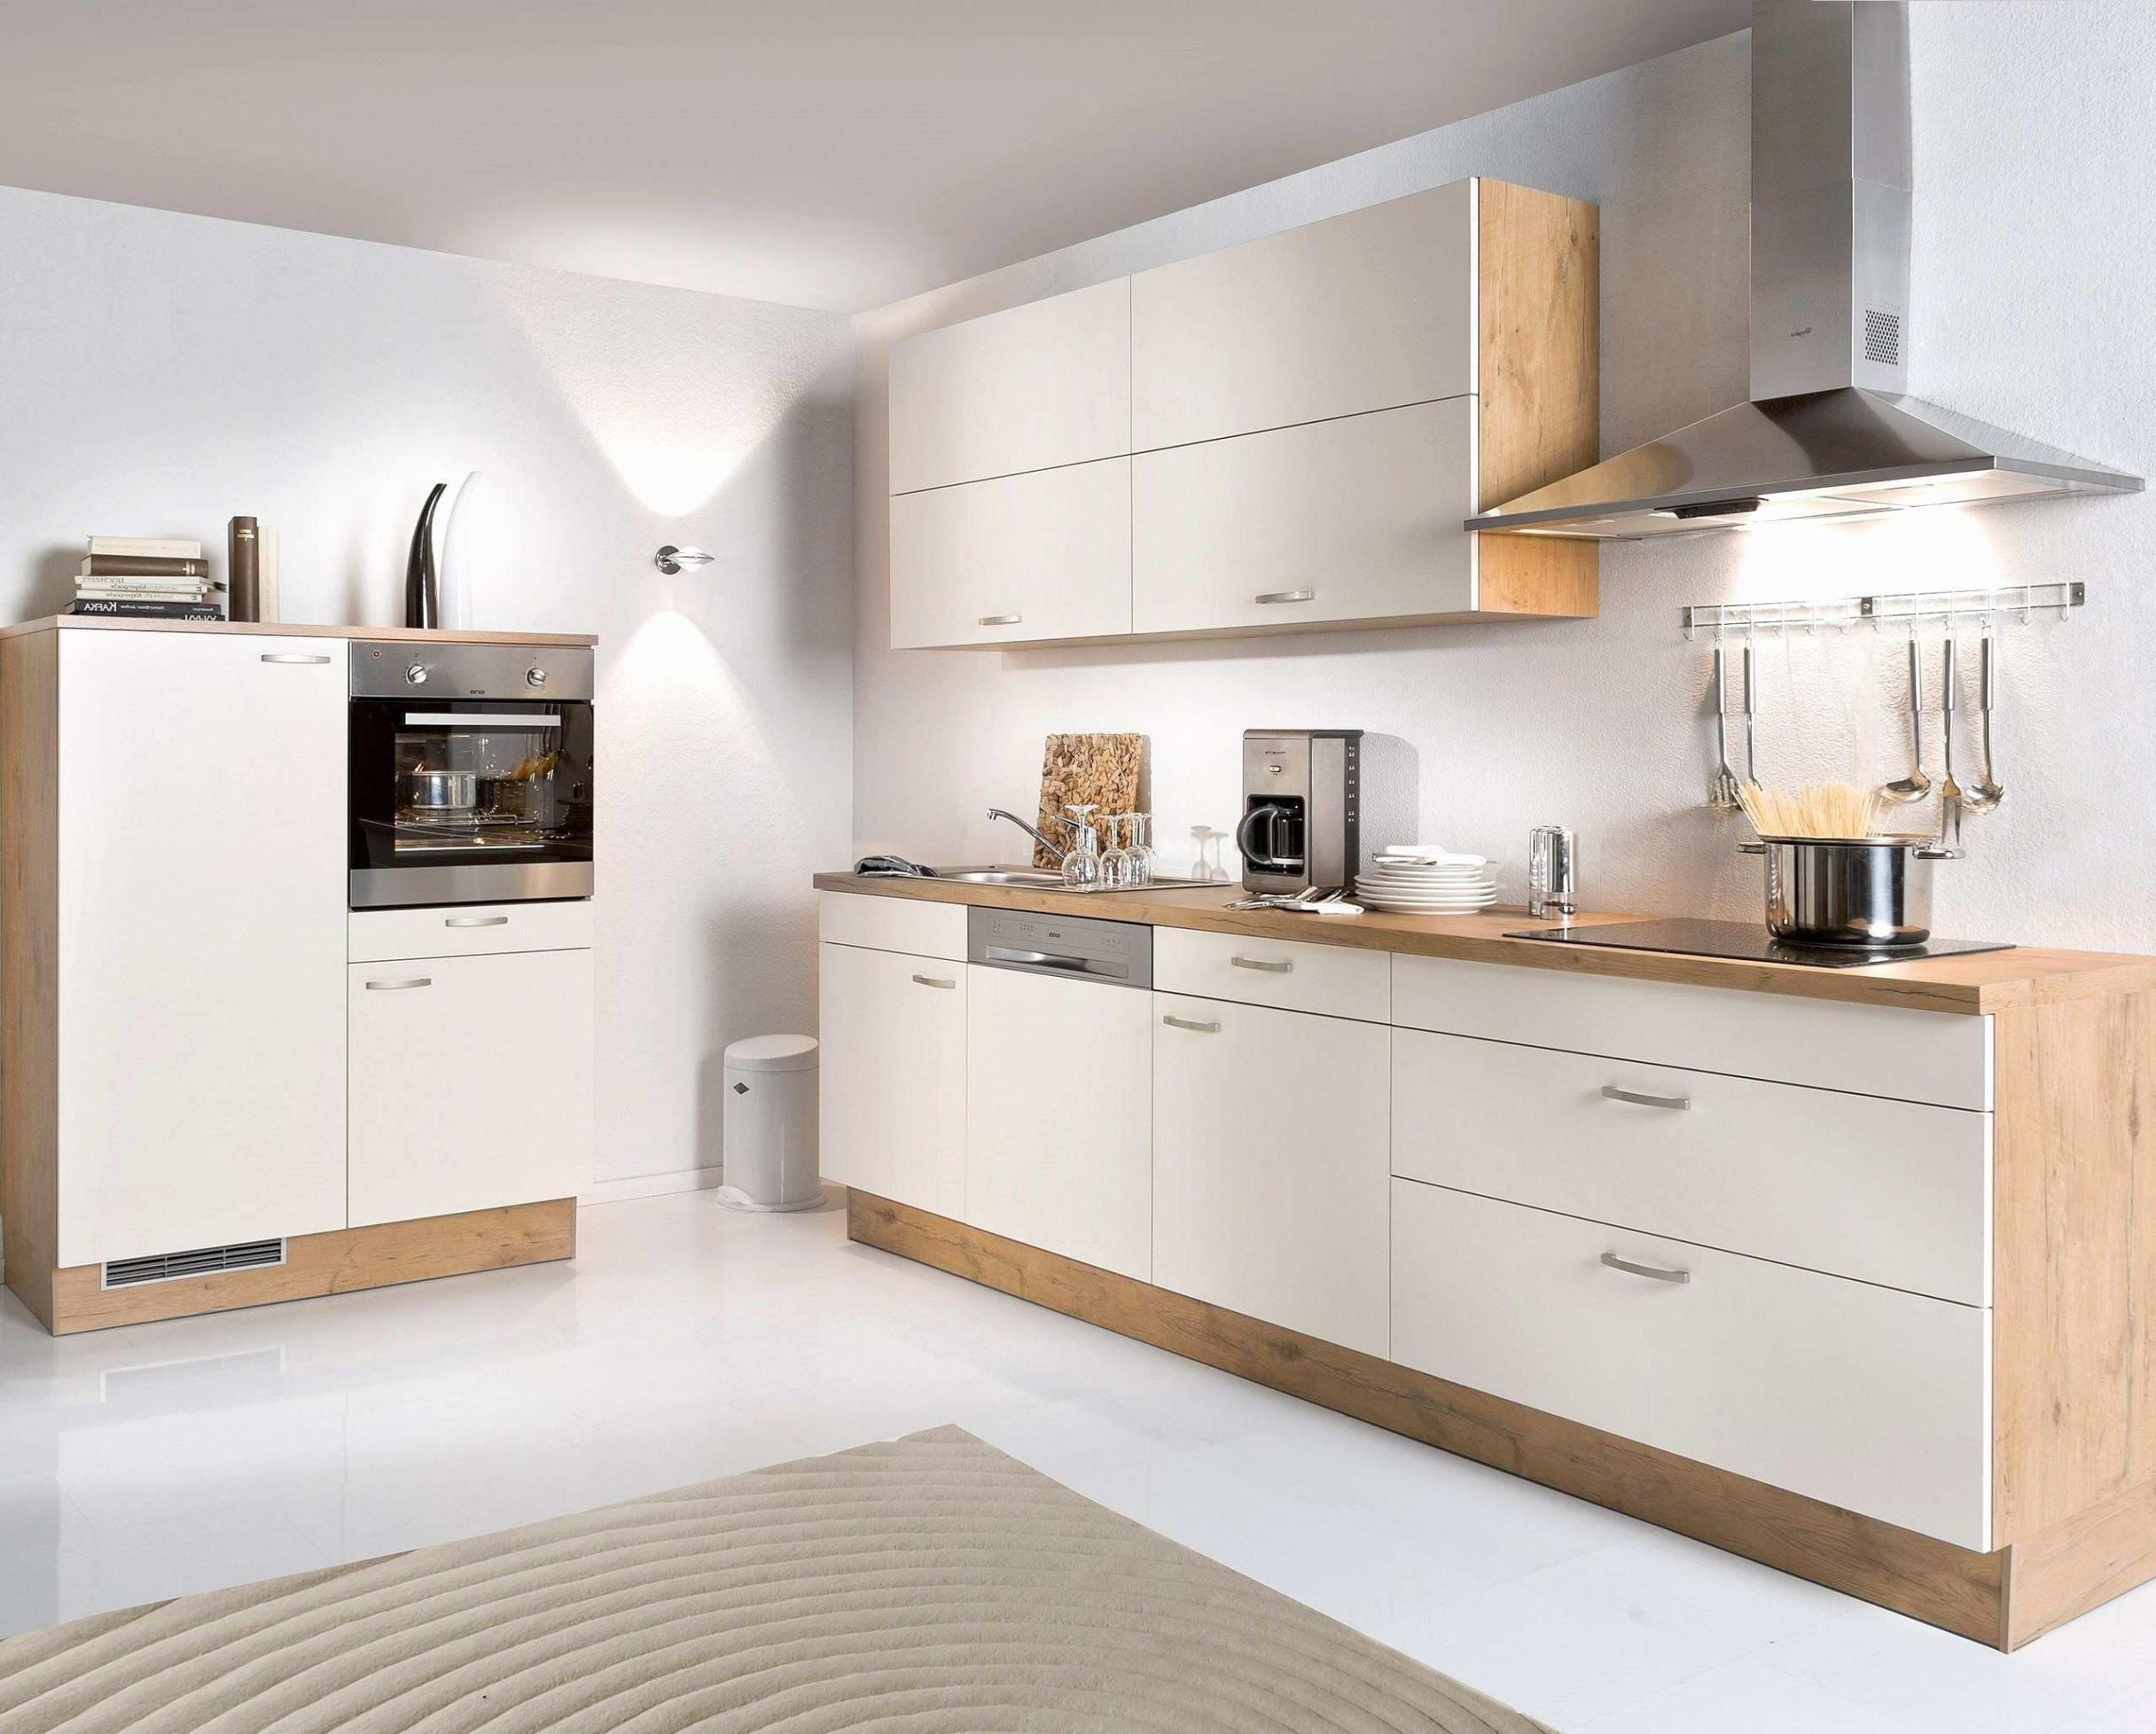 Full Size of Küche Arbeitsplatte Granit Ikea Schrankgriffe Küche Planen Tablet   Granit Arbeitsplatte Erfahrungen Küche Küche Planen